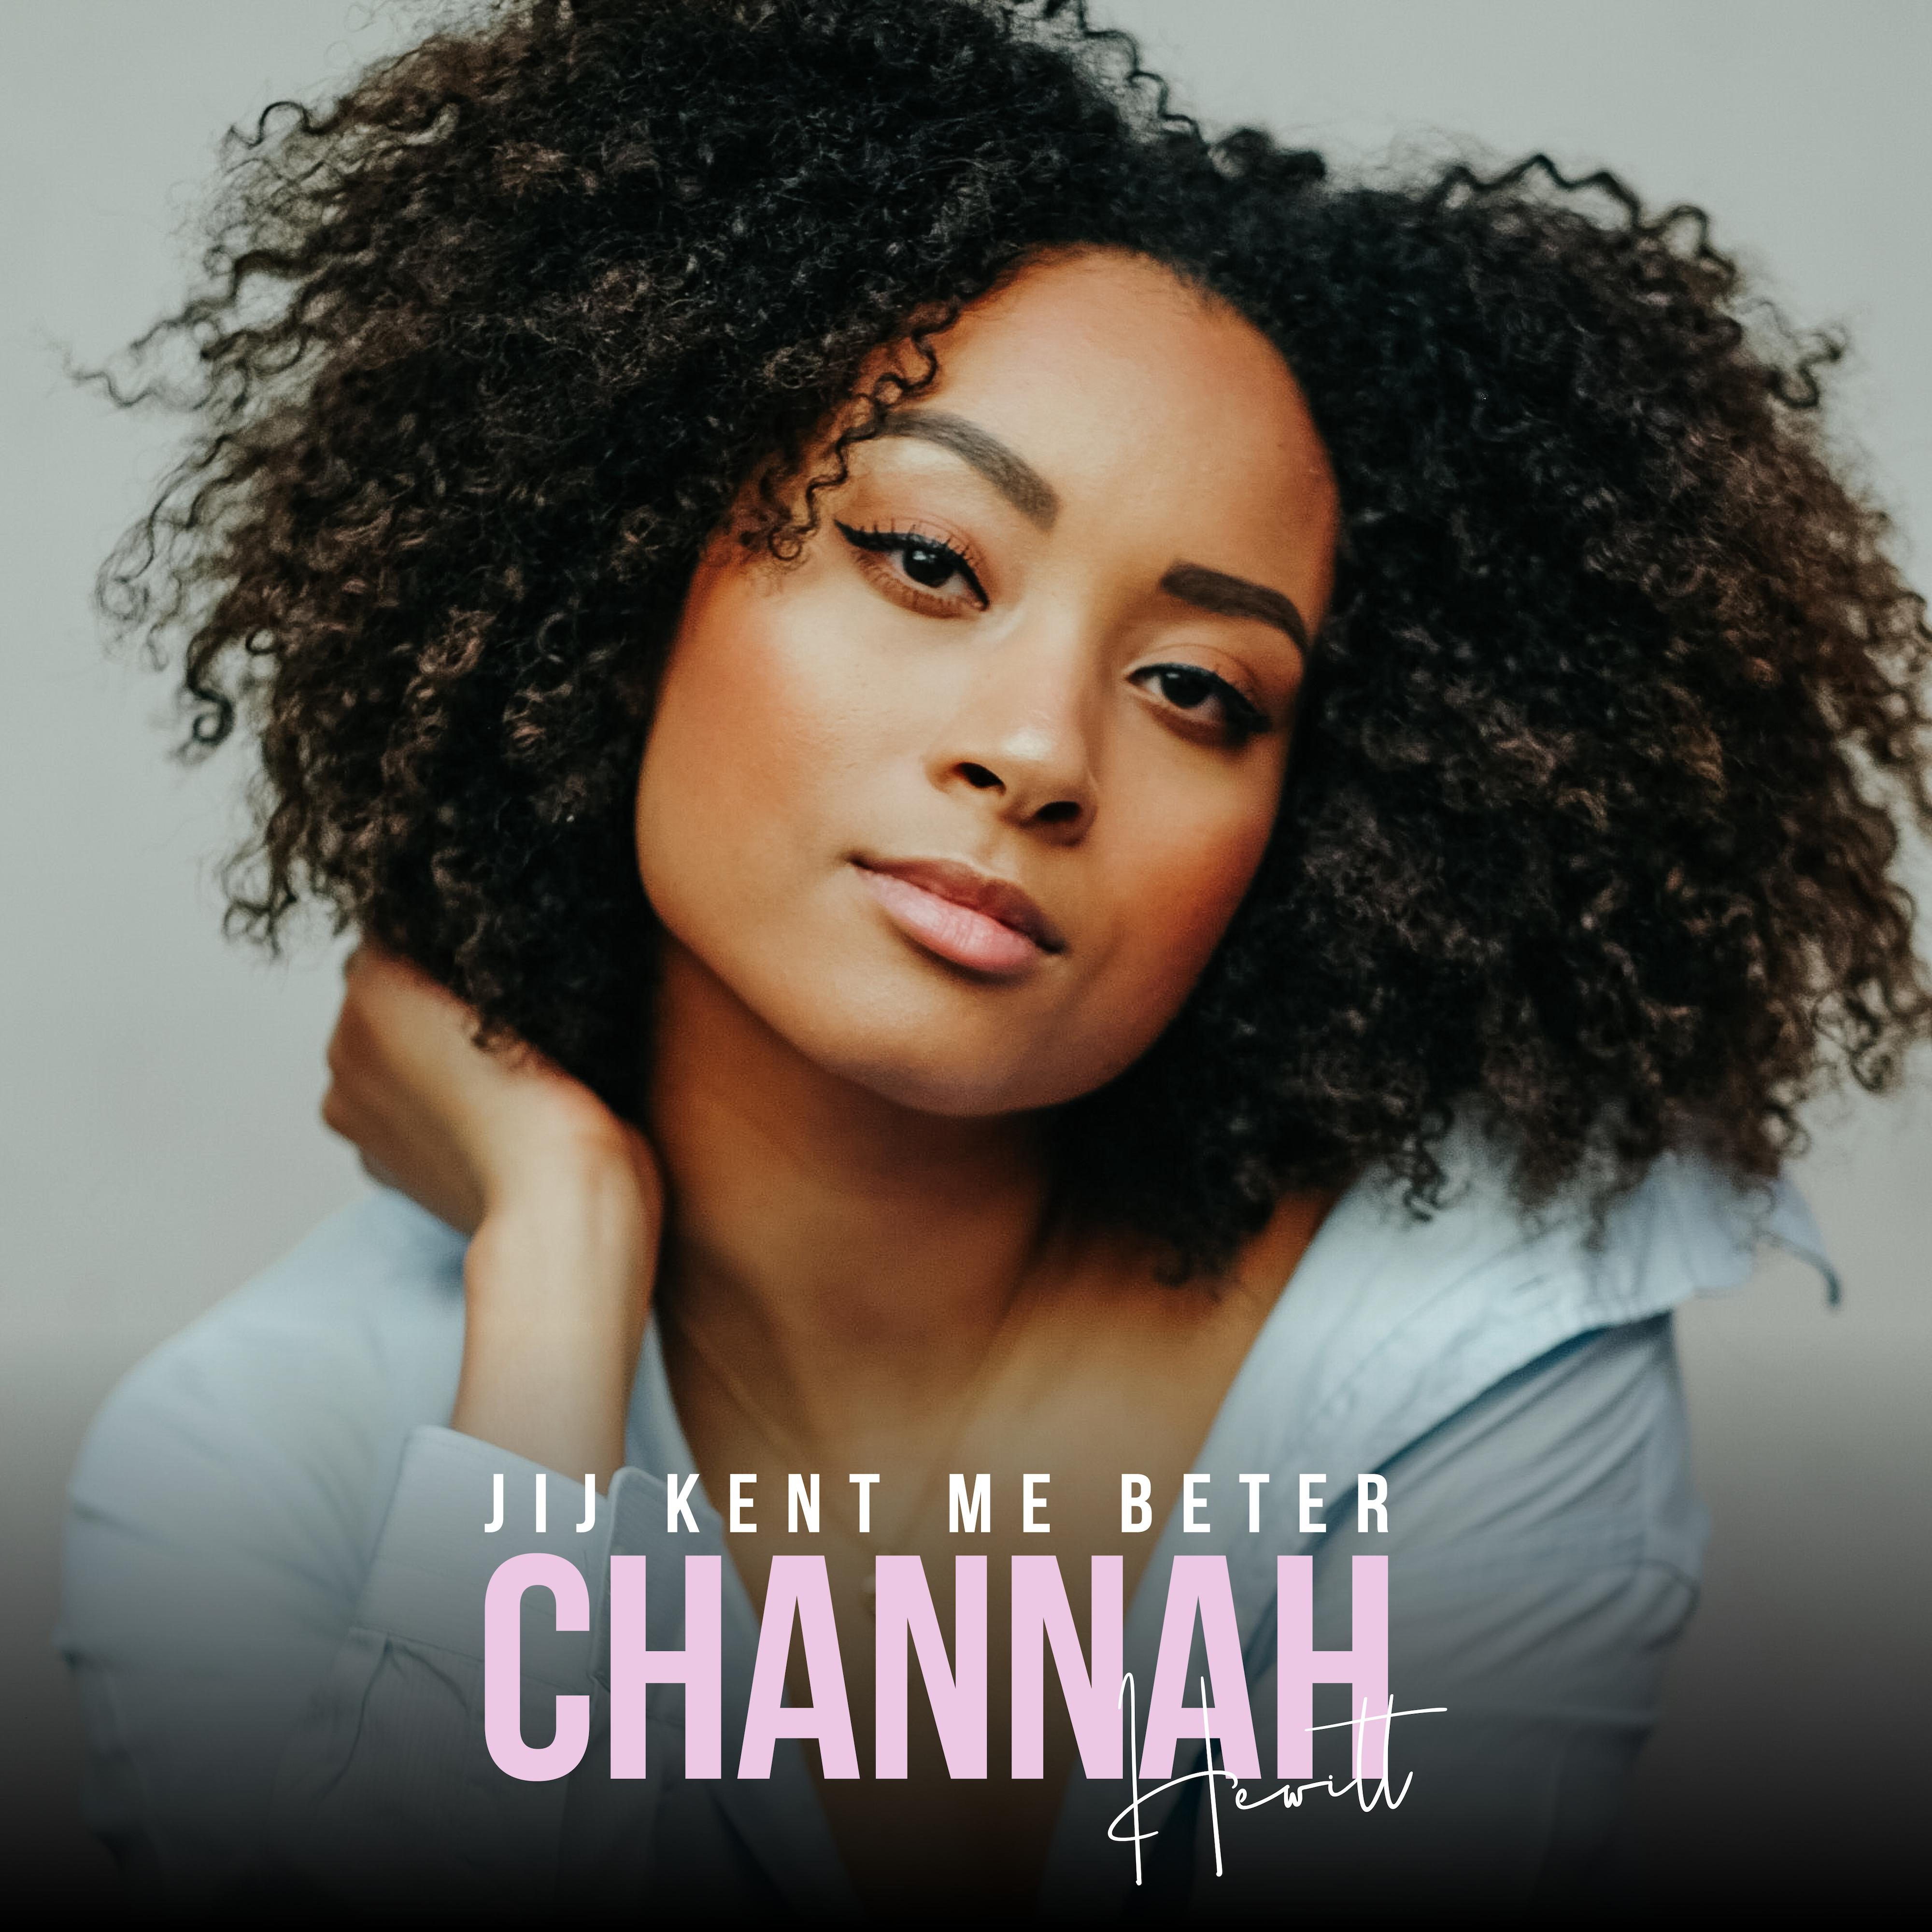 Nieuwe Single : CHANNAH – JIJ KENT ME BETER